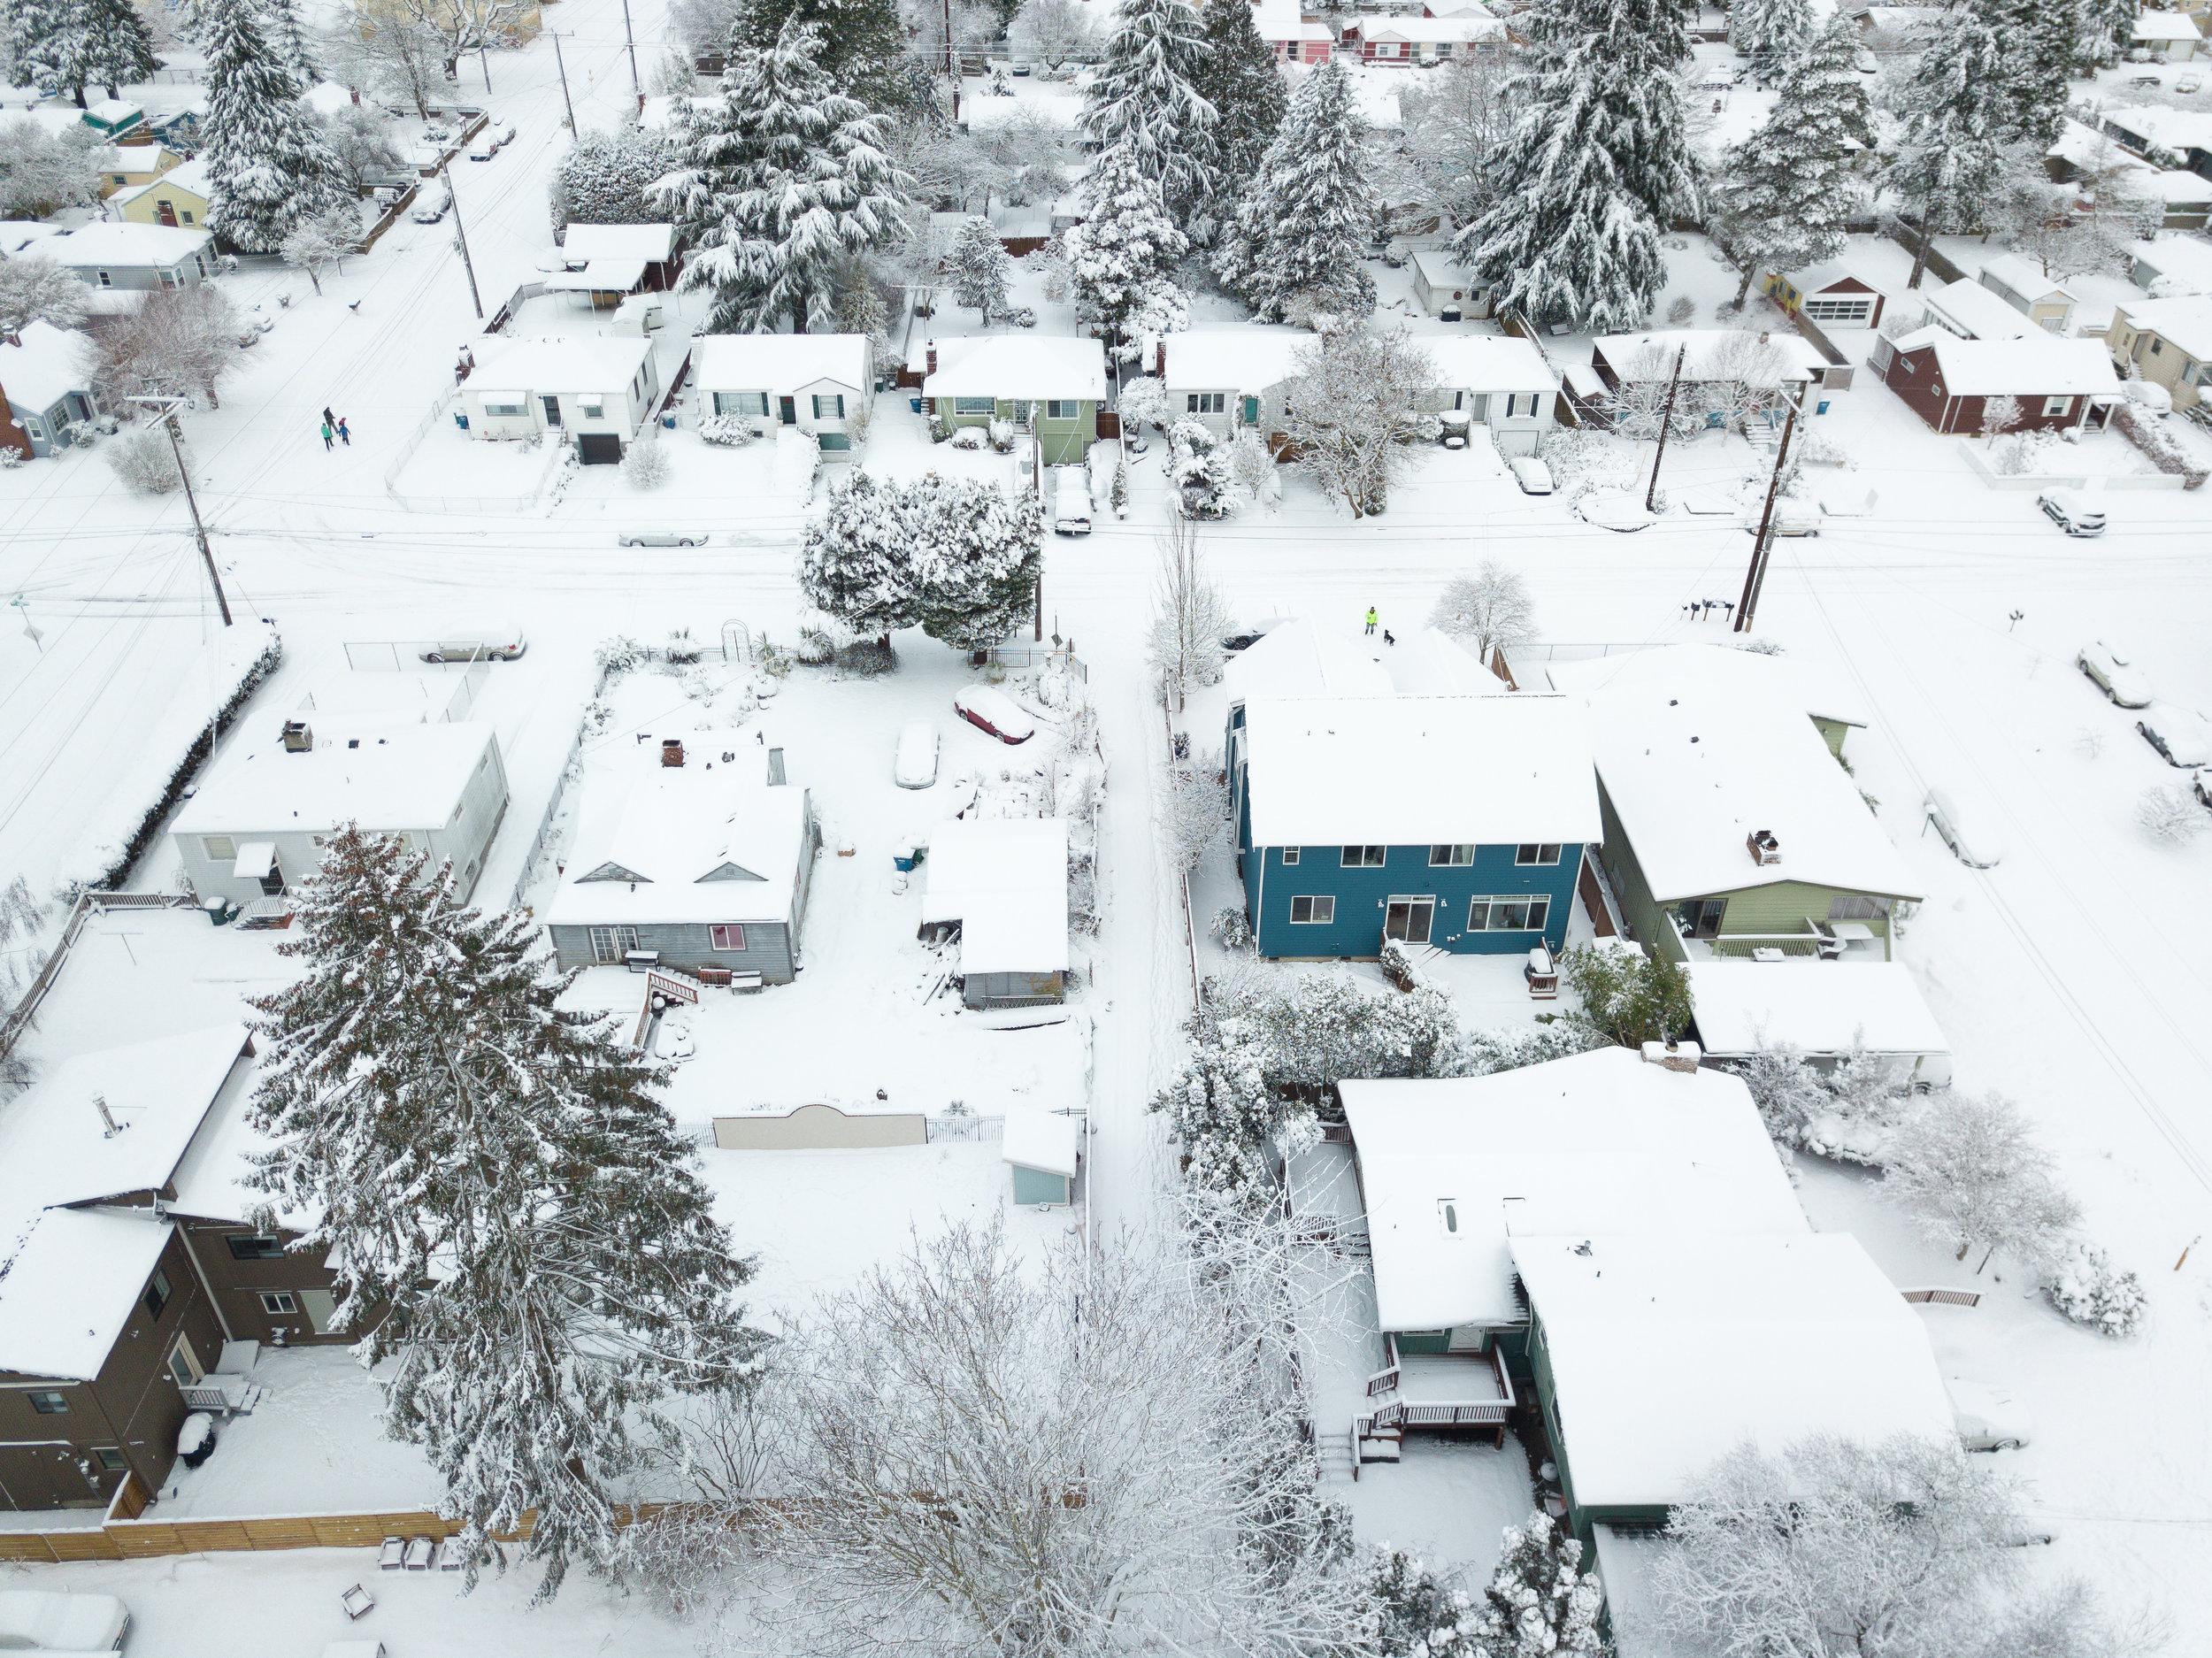 Looking over the snowy neighborhood  Camera: DJI Mavic Pro Shutter speed: 1/320 sec Aperture: f/2.2 ISO: 100 Photo: Jeff Carlson